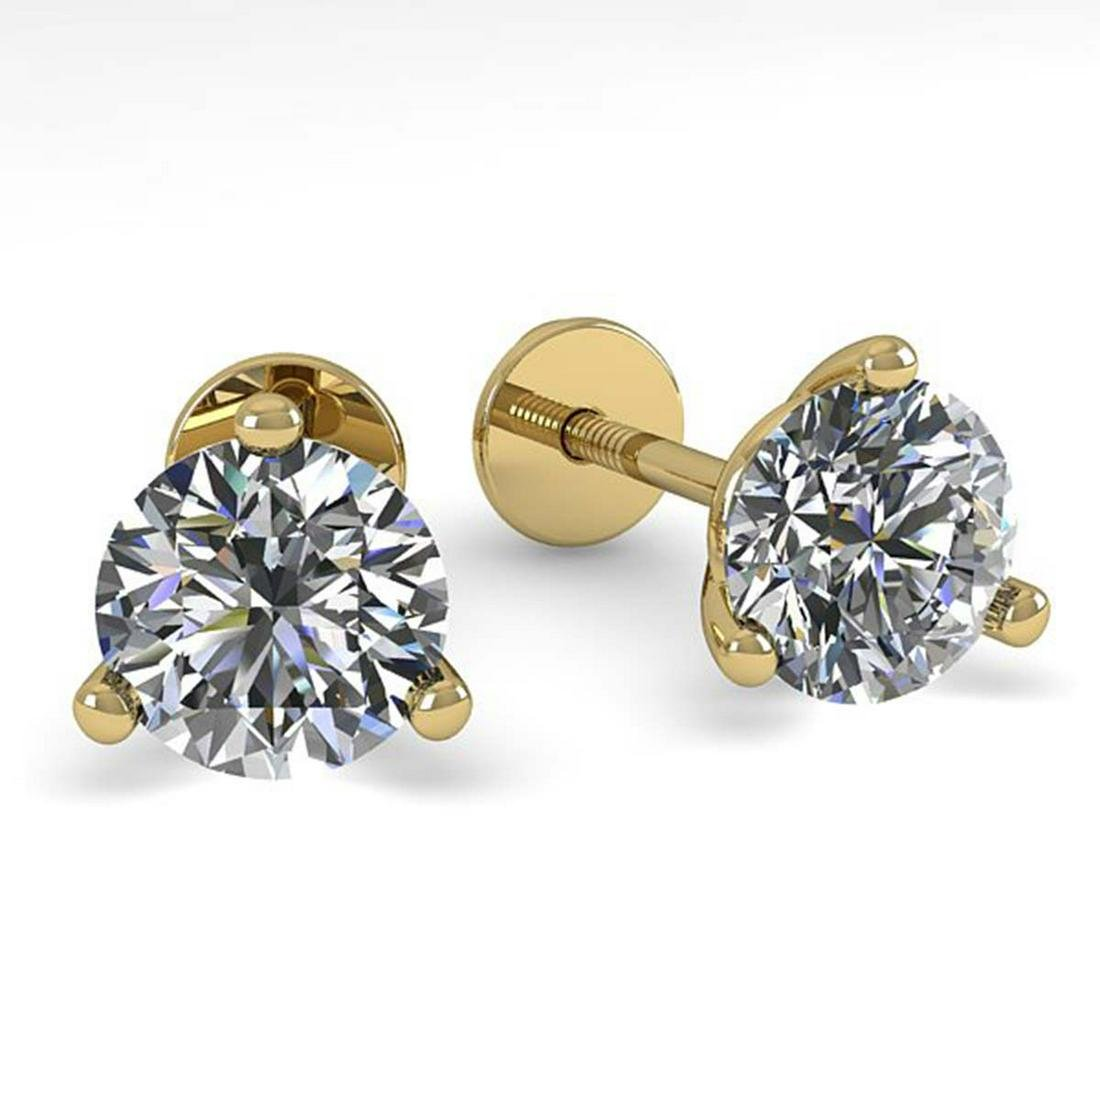 0.50 ctw VS/SI Diamond Stud Earrings 14K Yellow Gold -